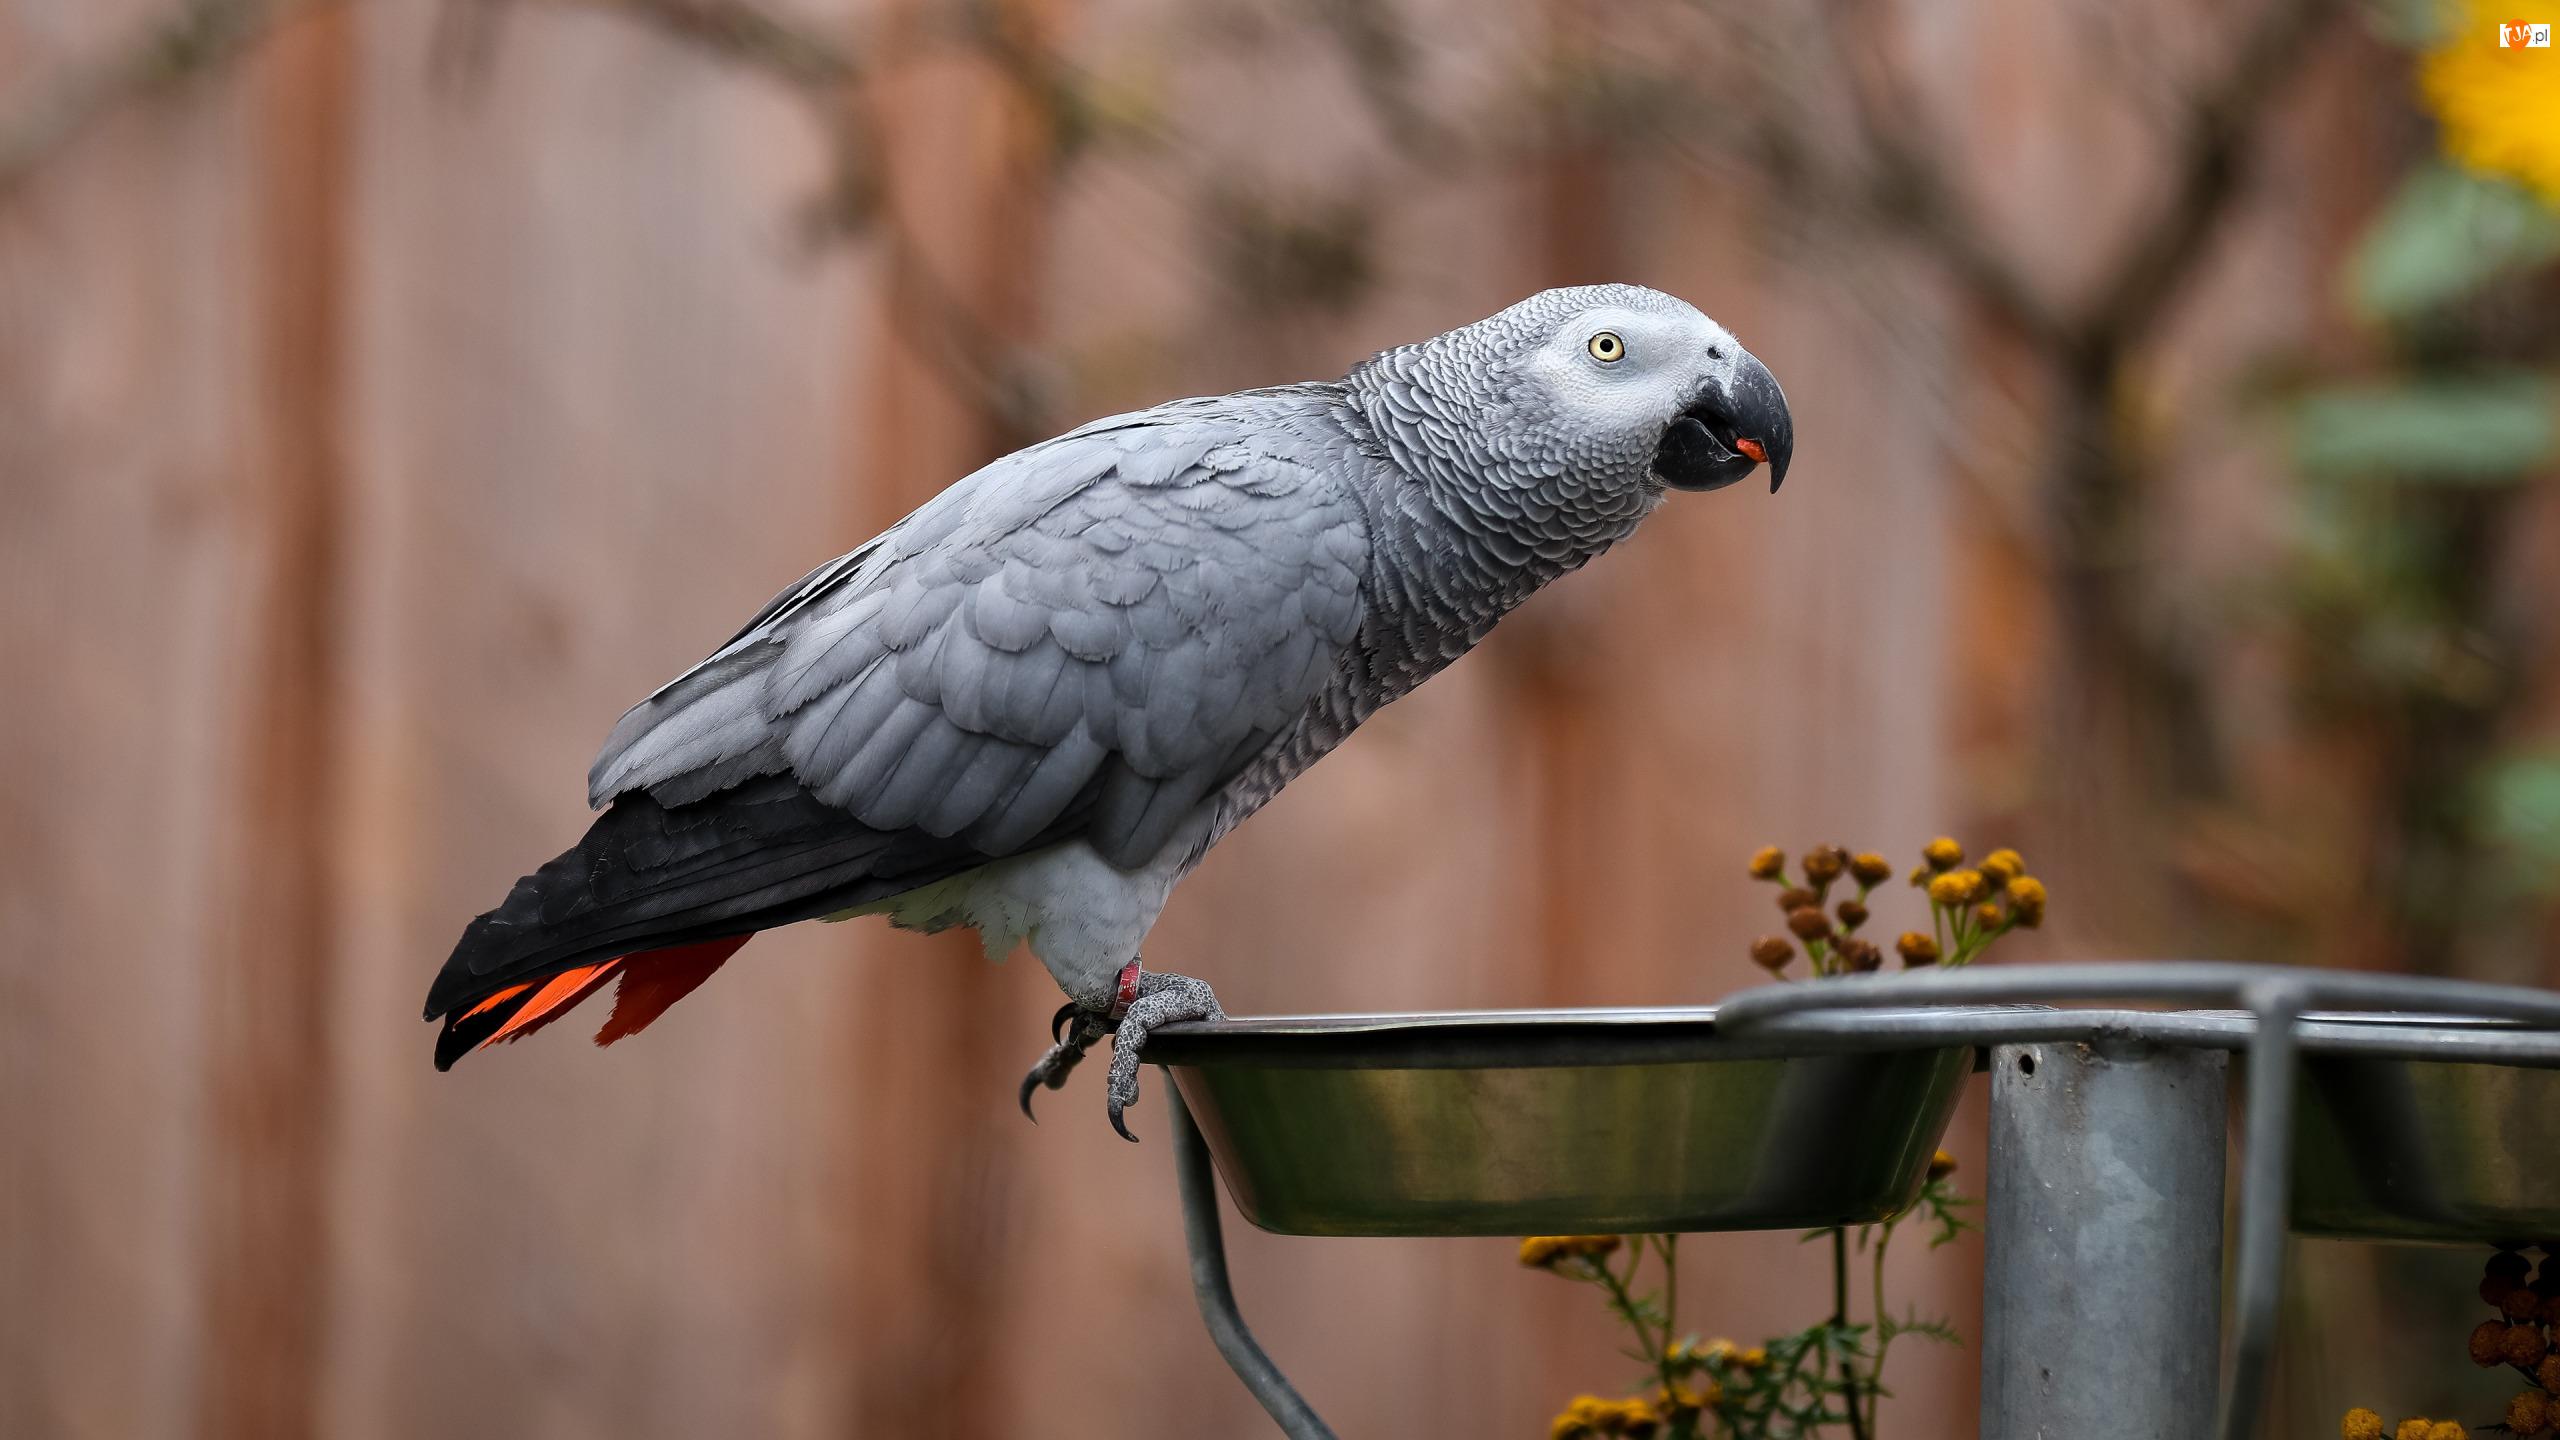 Miseczka, Papuga, Żako